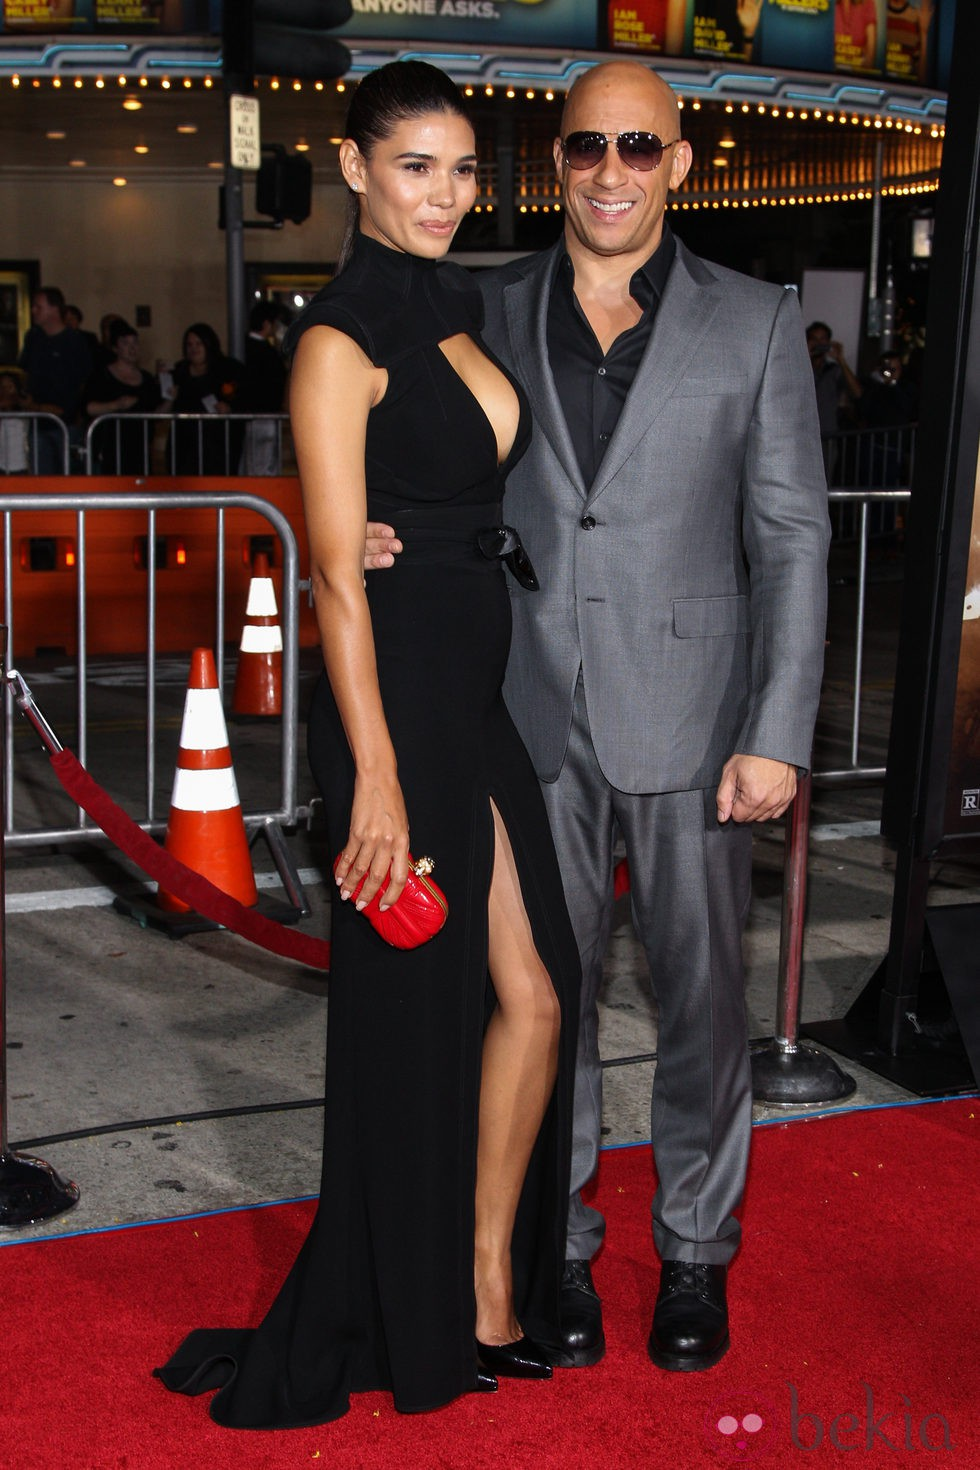 Paloma Jimenez And Vin Diesel 2013 | Autos Weblog